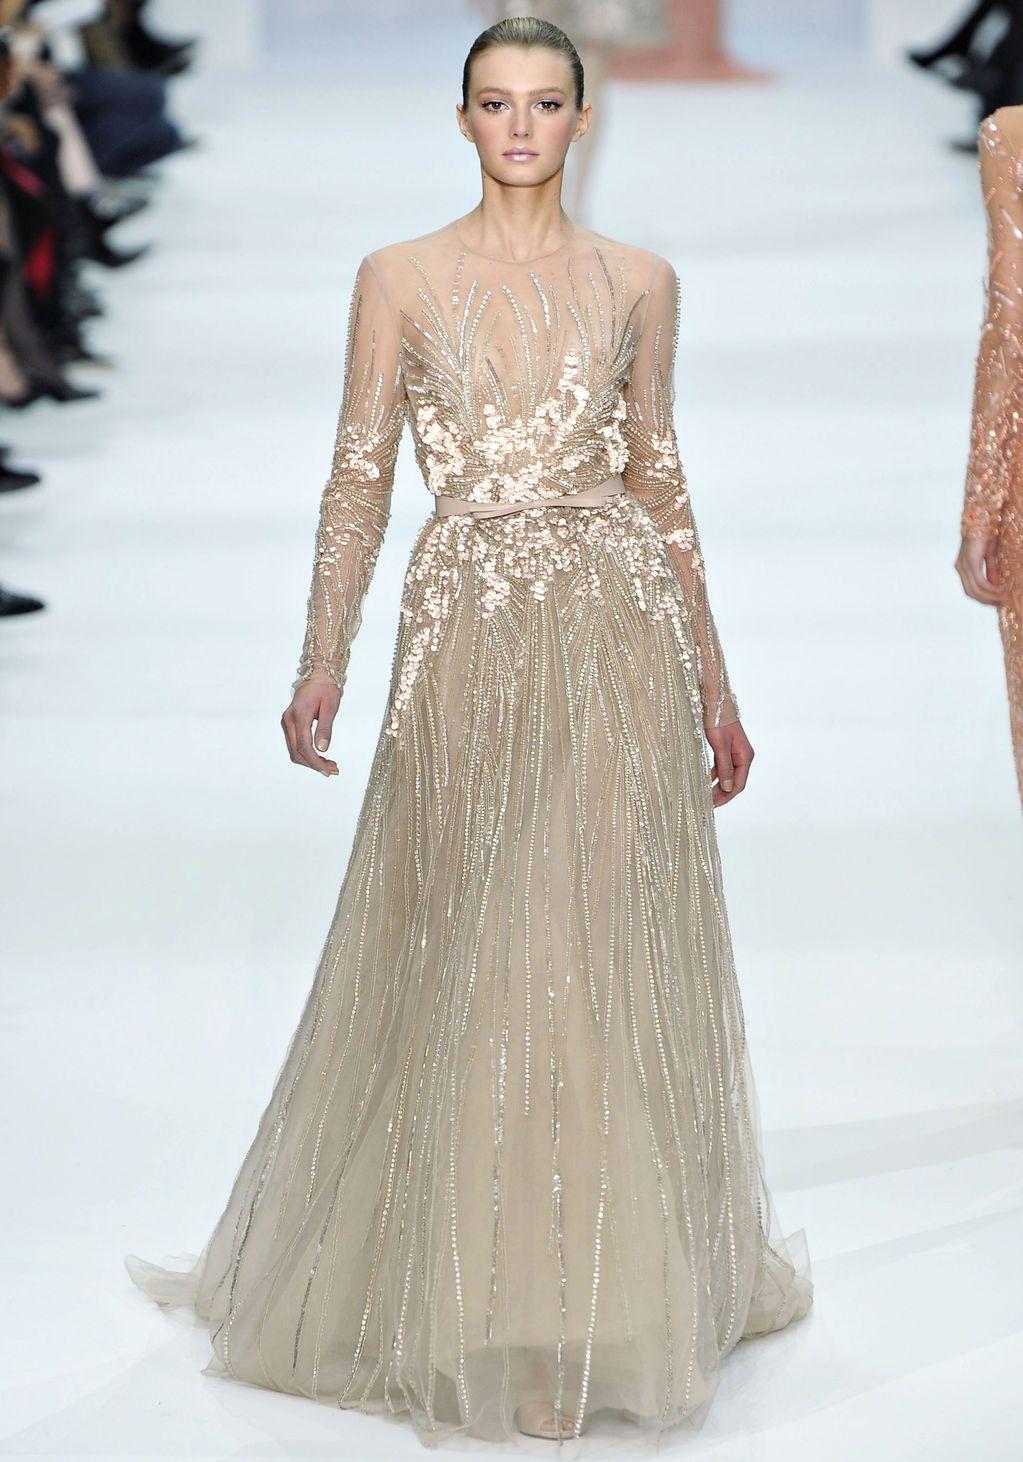 Elie saab couture pinterest elie saab gowns and fashion details